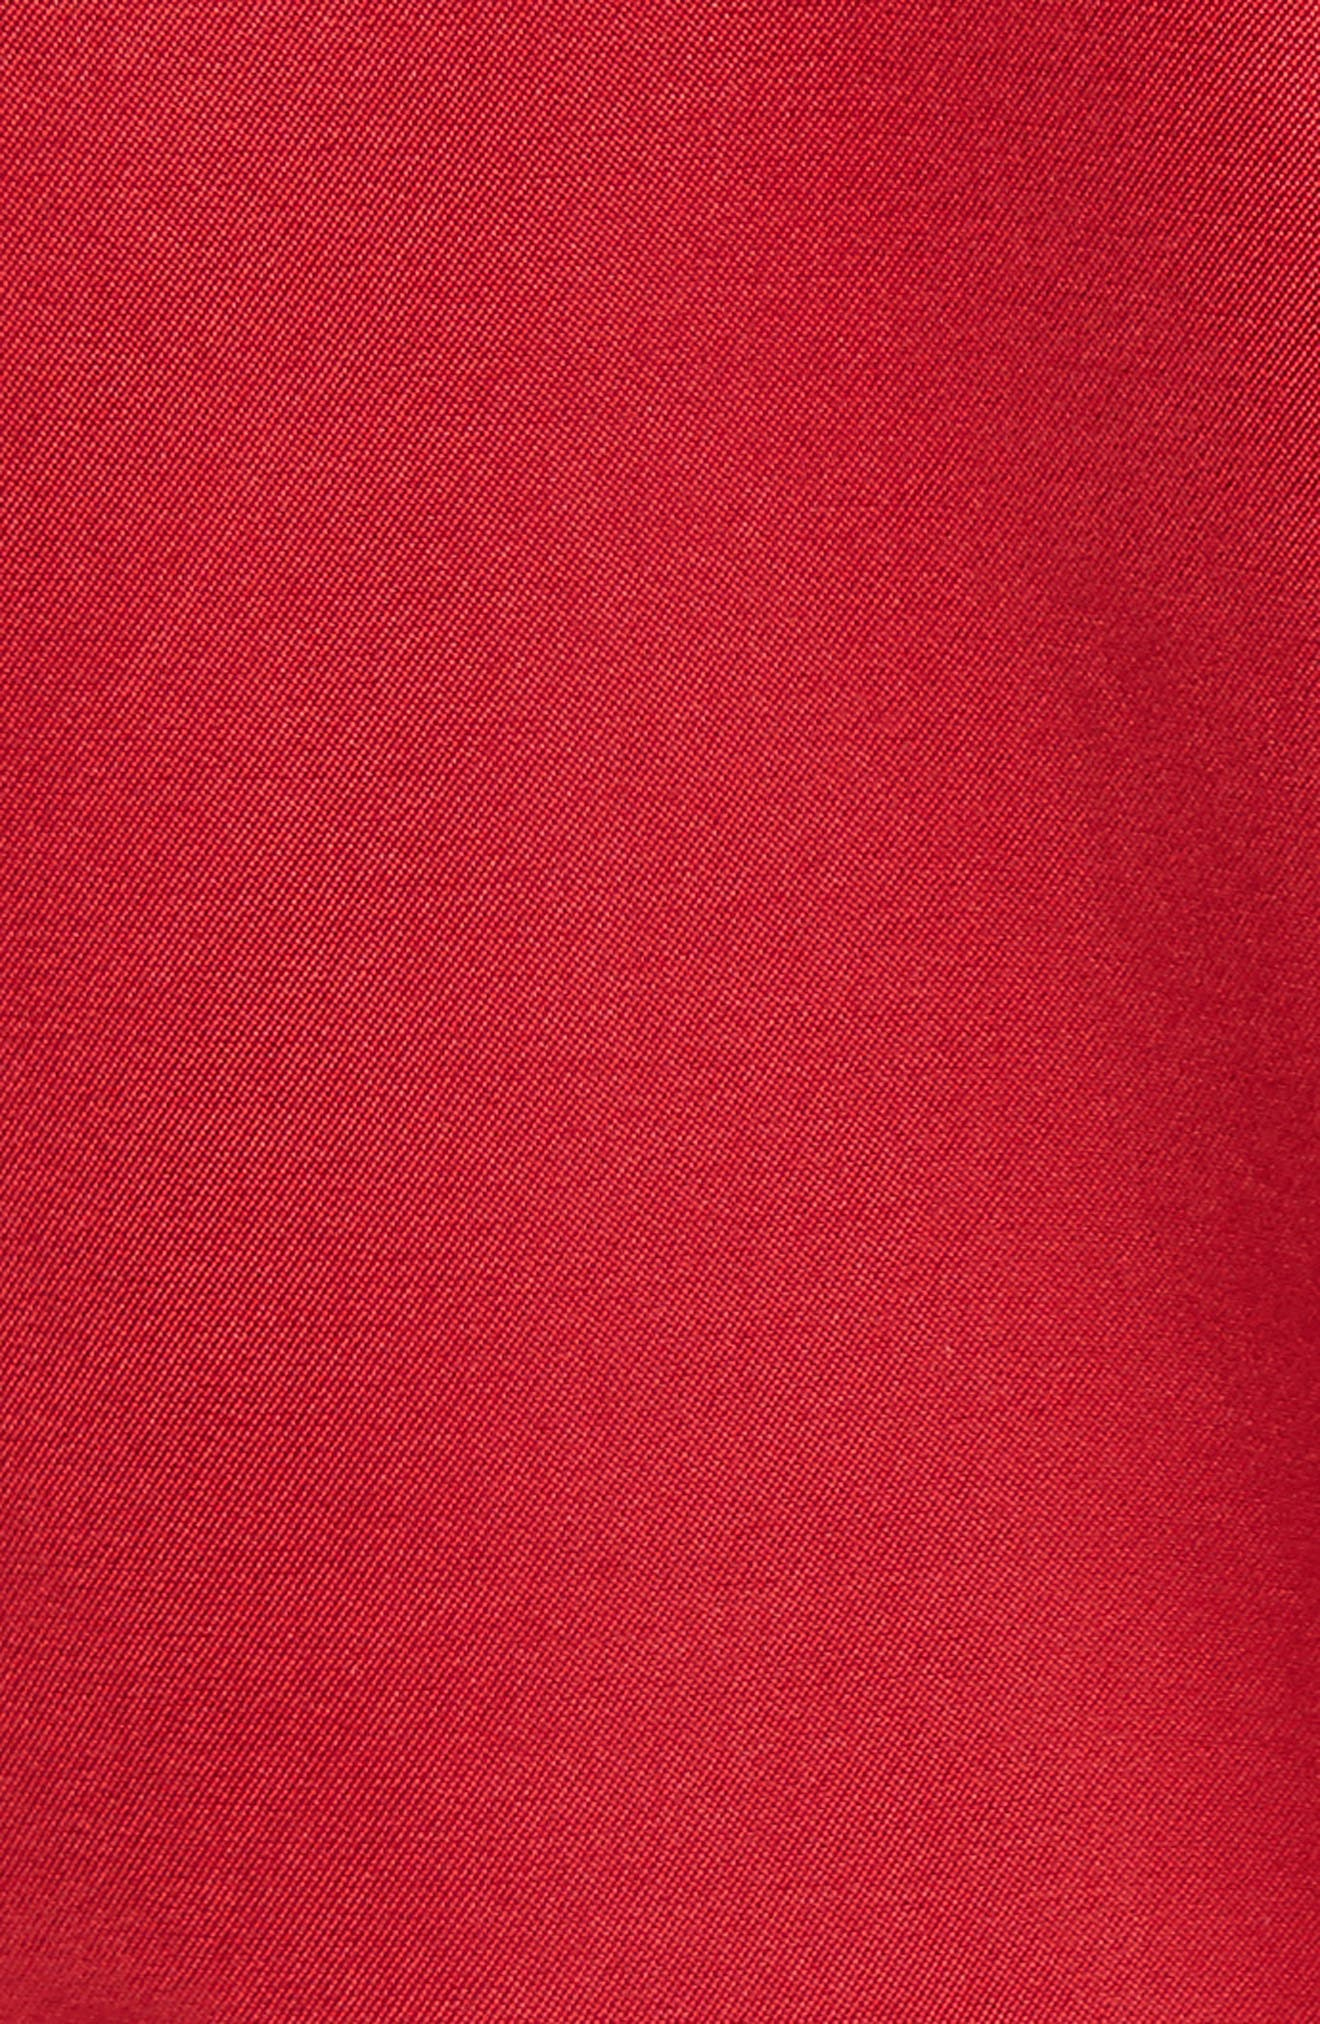 Rockstud Satin Bomber Jacket,                             Alternate thumbnail 6, color,                             RED